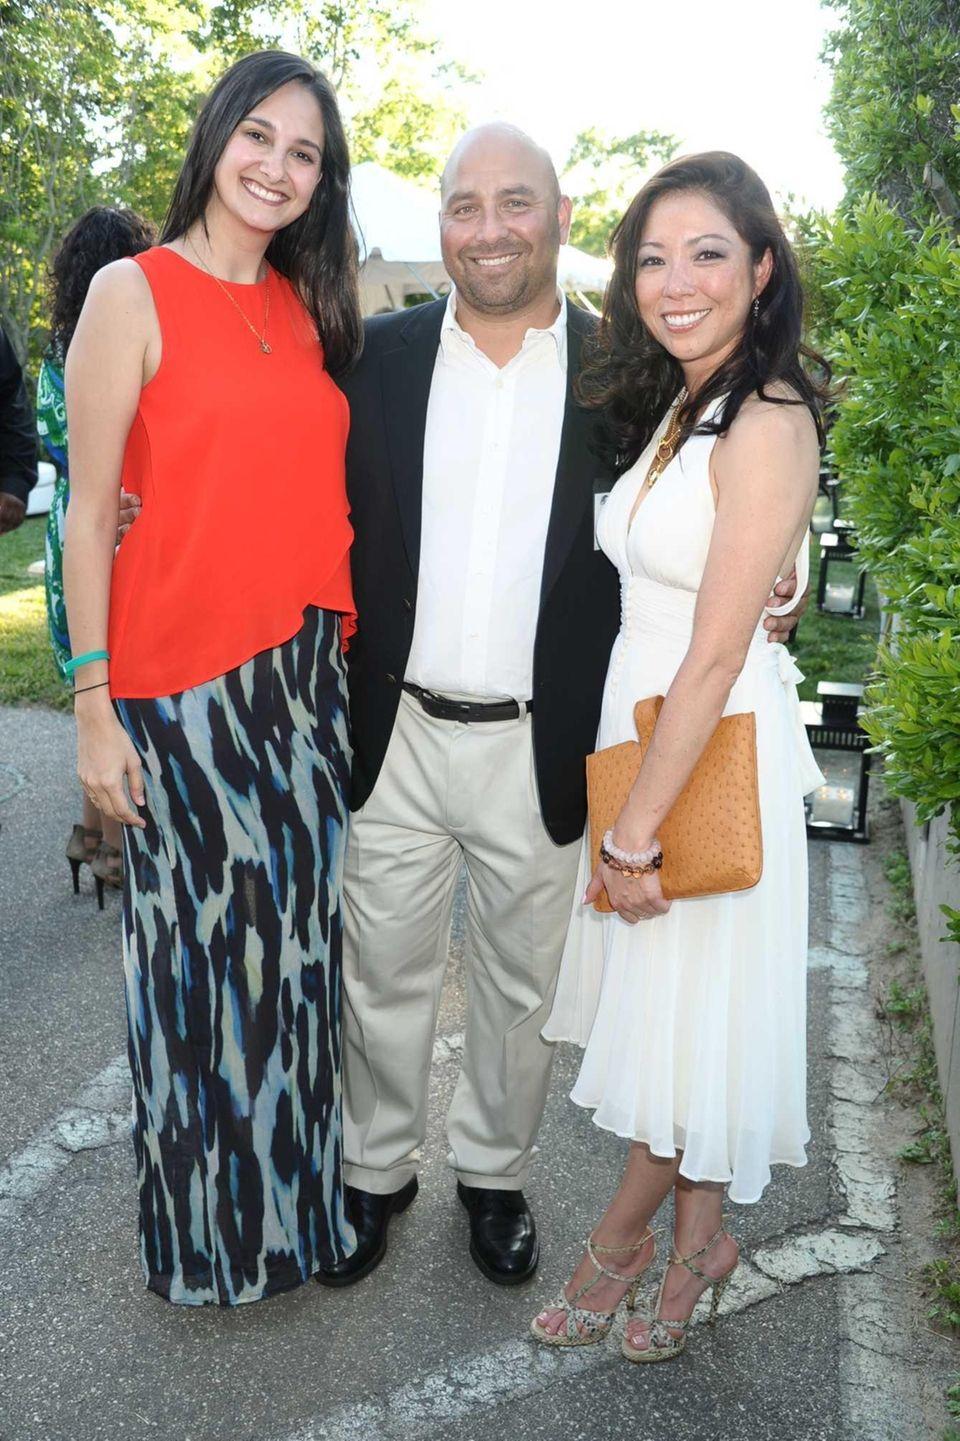 Fernanda Zapato, Frank Ocevedo, and Amy Ma attend